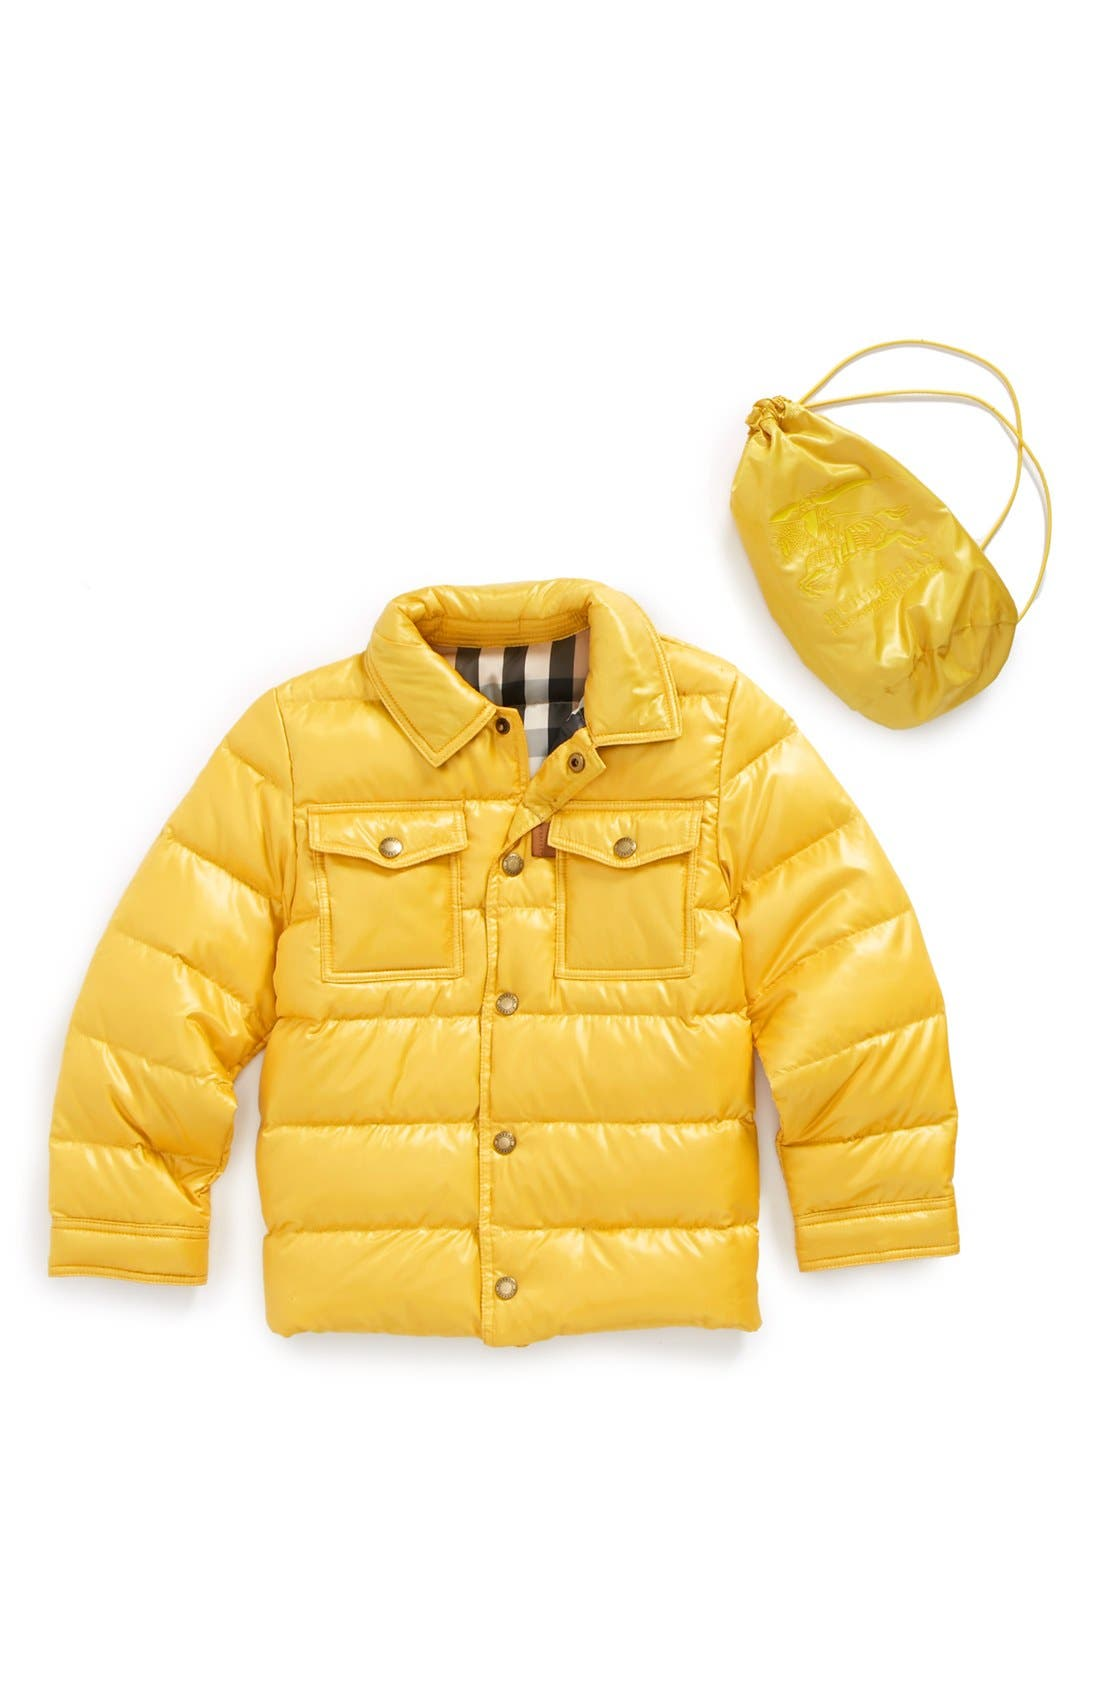 Main Image - Burberry Down Puffer Jacket (Toddler Boys, Little Boys & Big Boys)